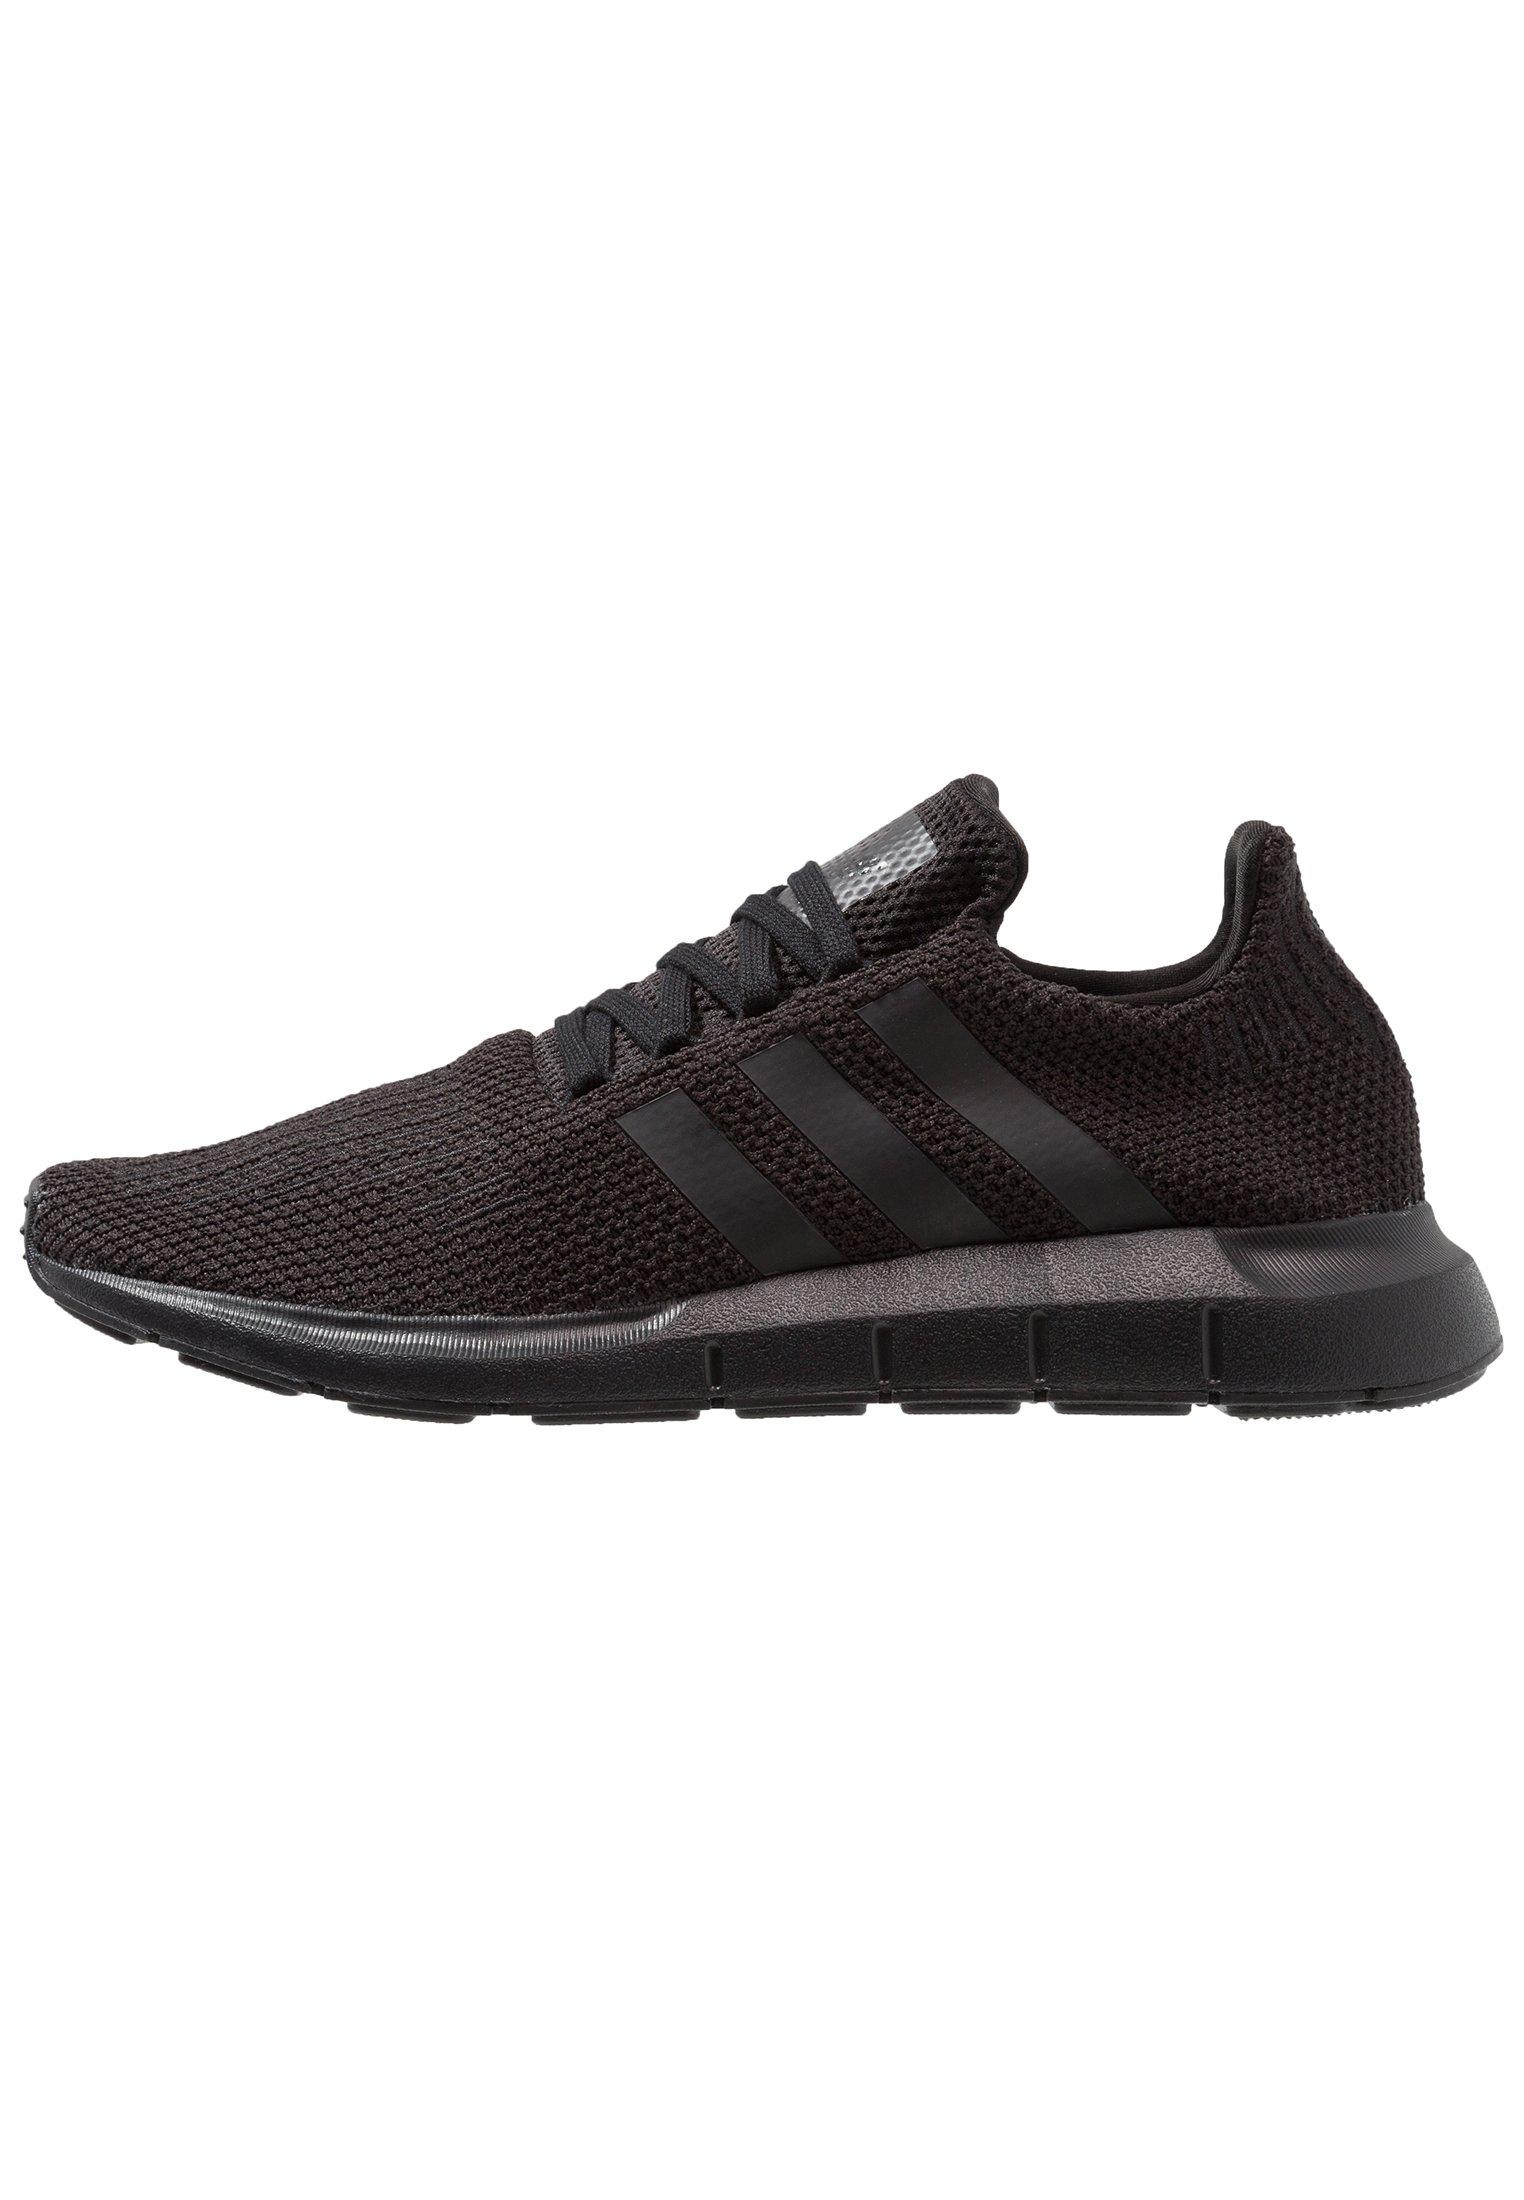 adidas Originals SWIFT RUN Sneakers core blackfootwear